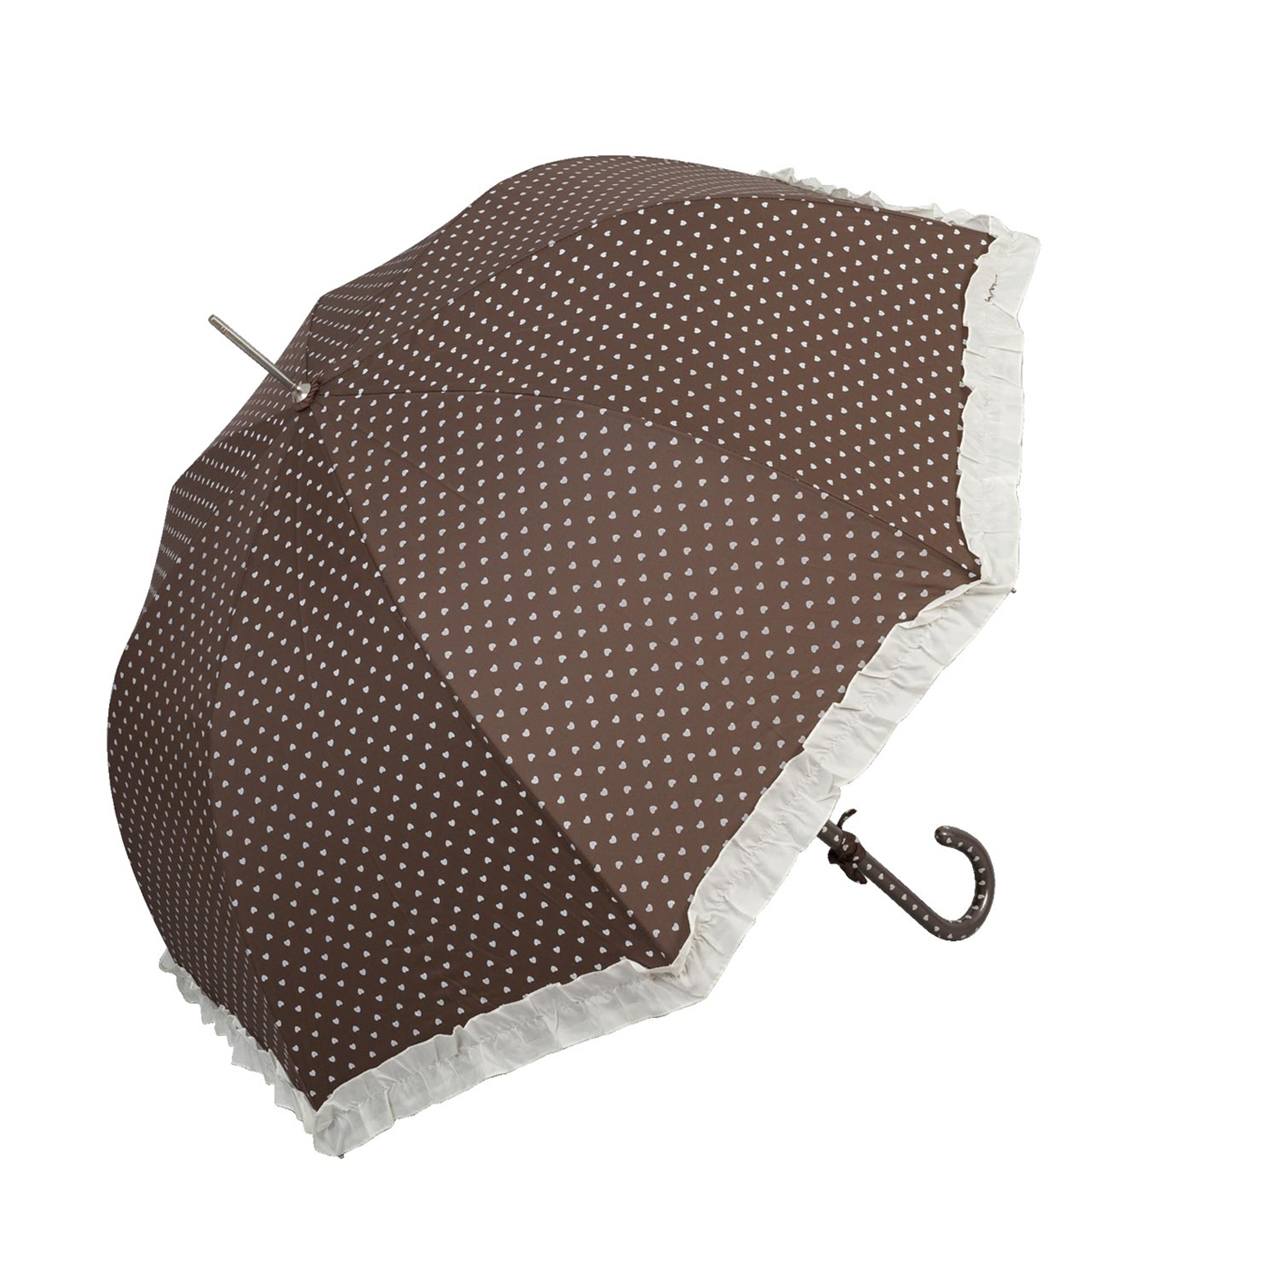 Umbrela Cu Inimioare Din Textil Maro